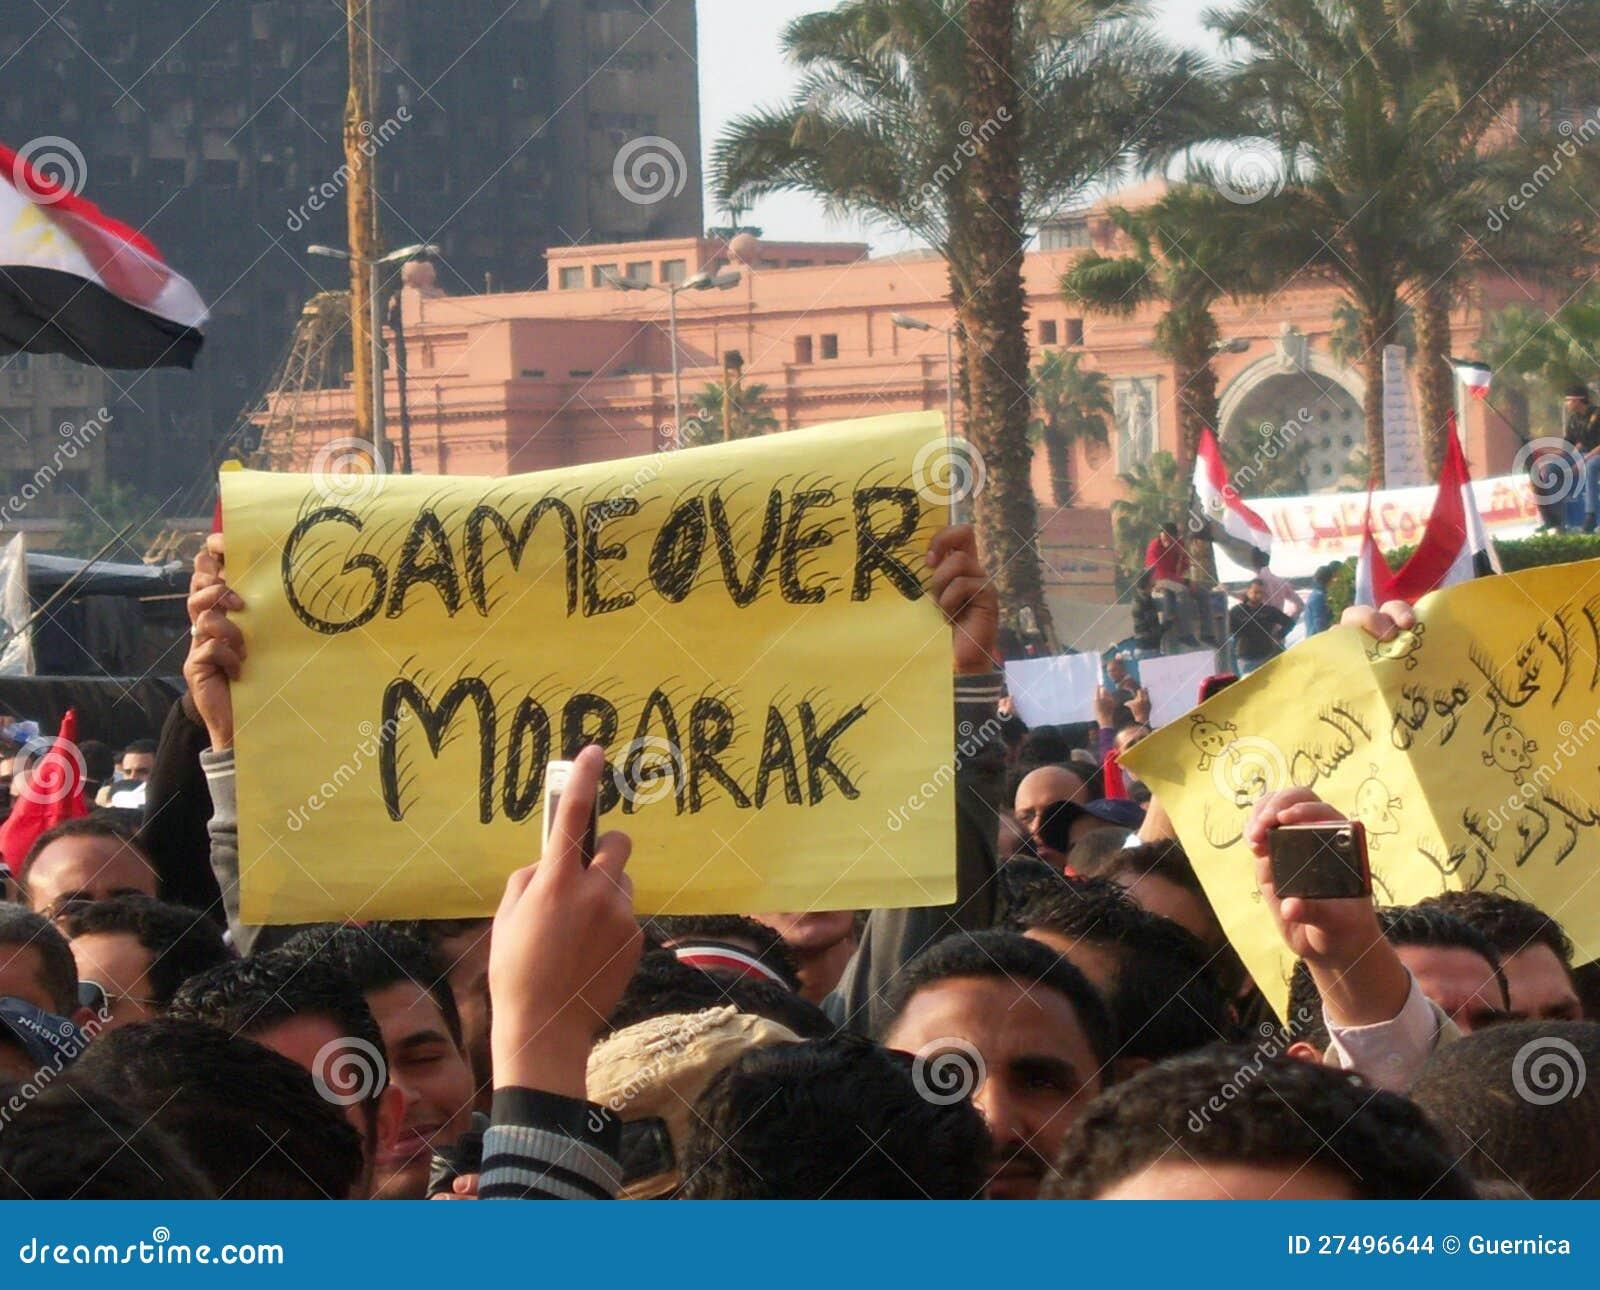 Tahrir Square cemonstrators